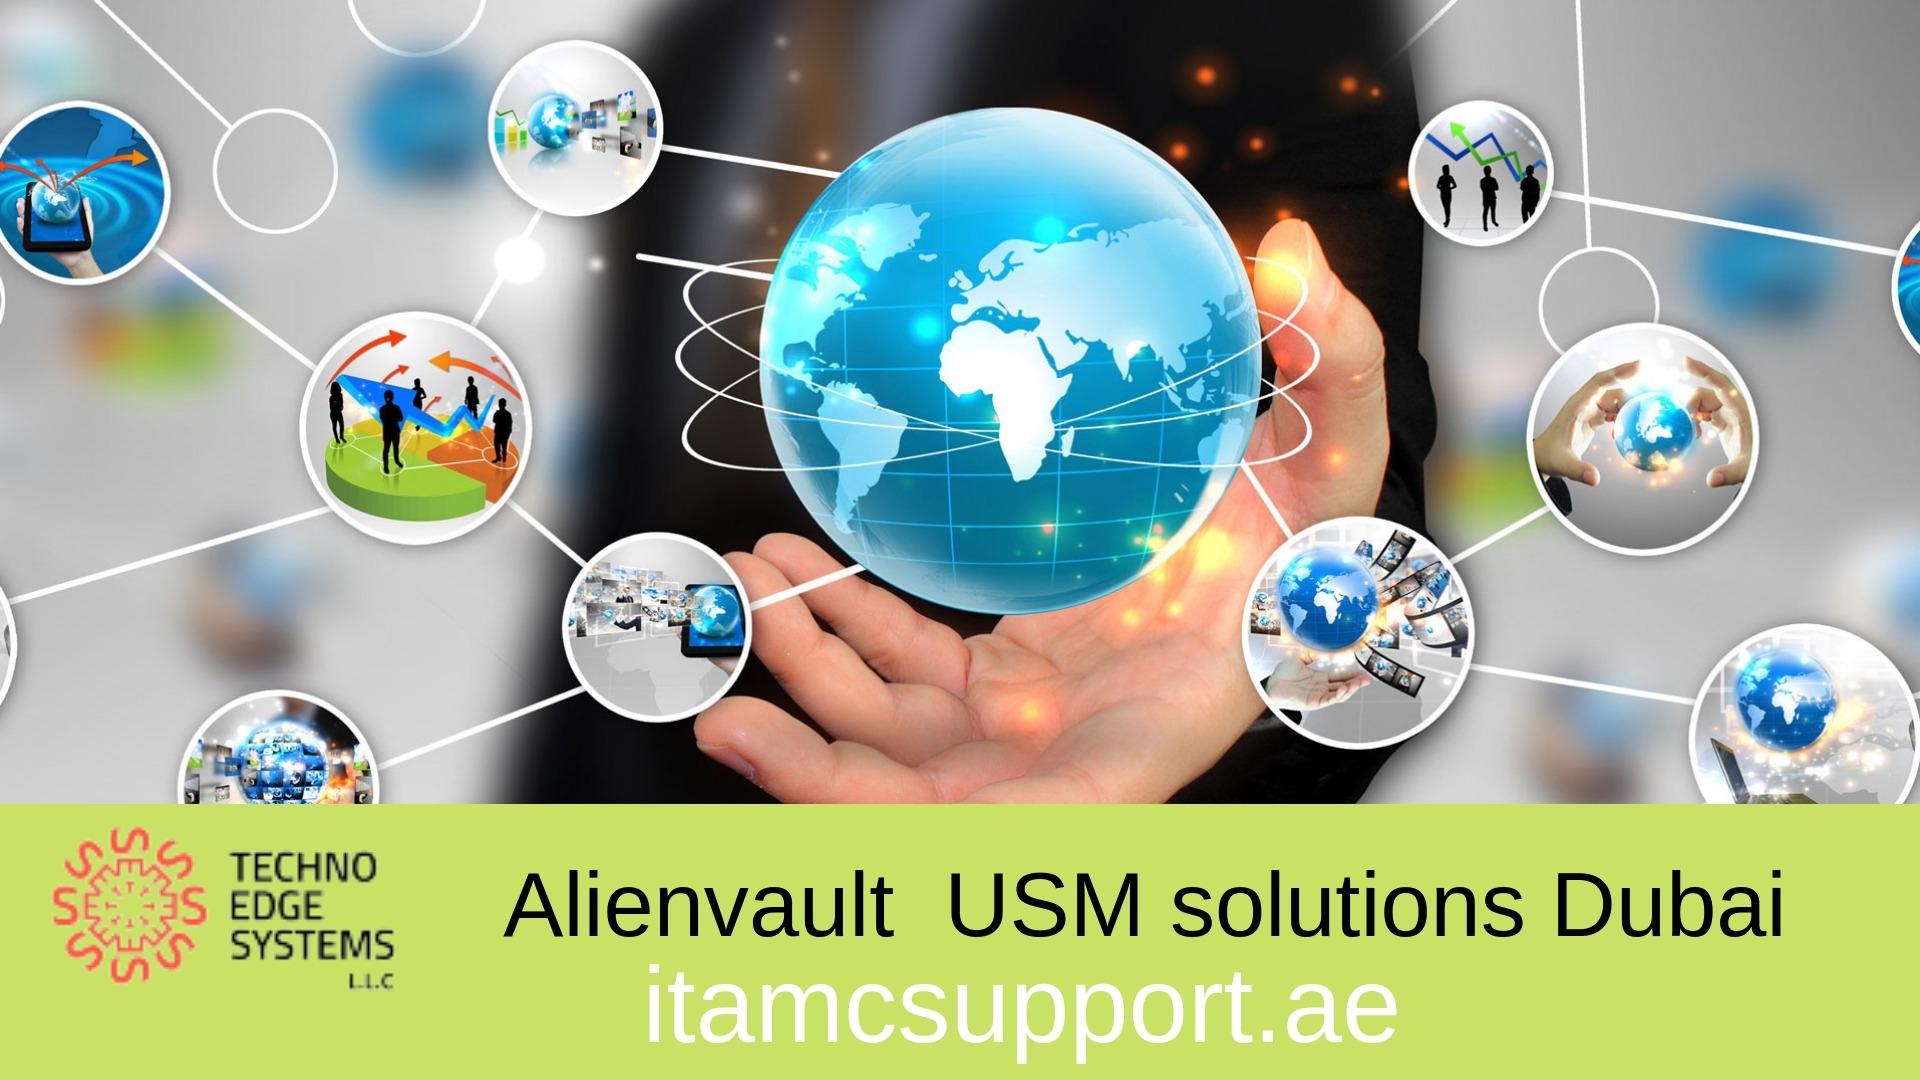 Alienvault usm solutions dubai USM Solutions provider in dubai 1920x1080